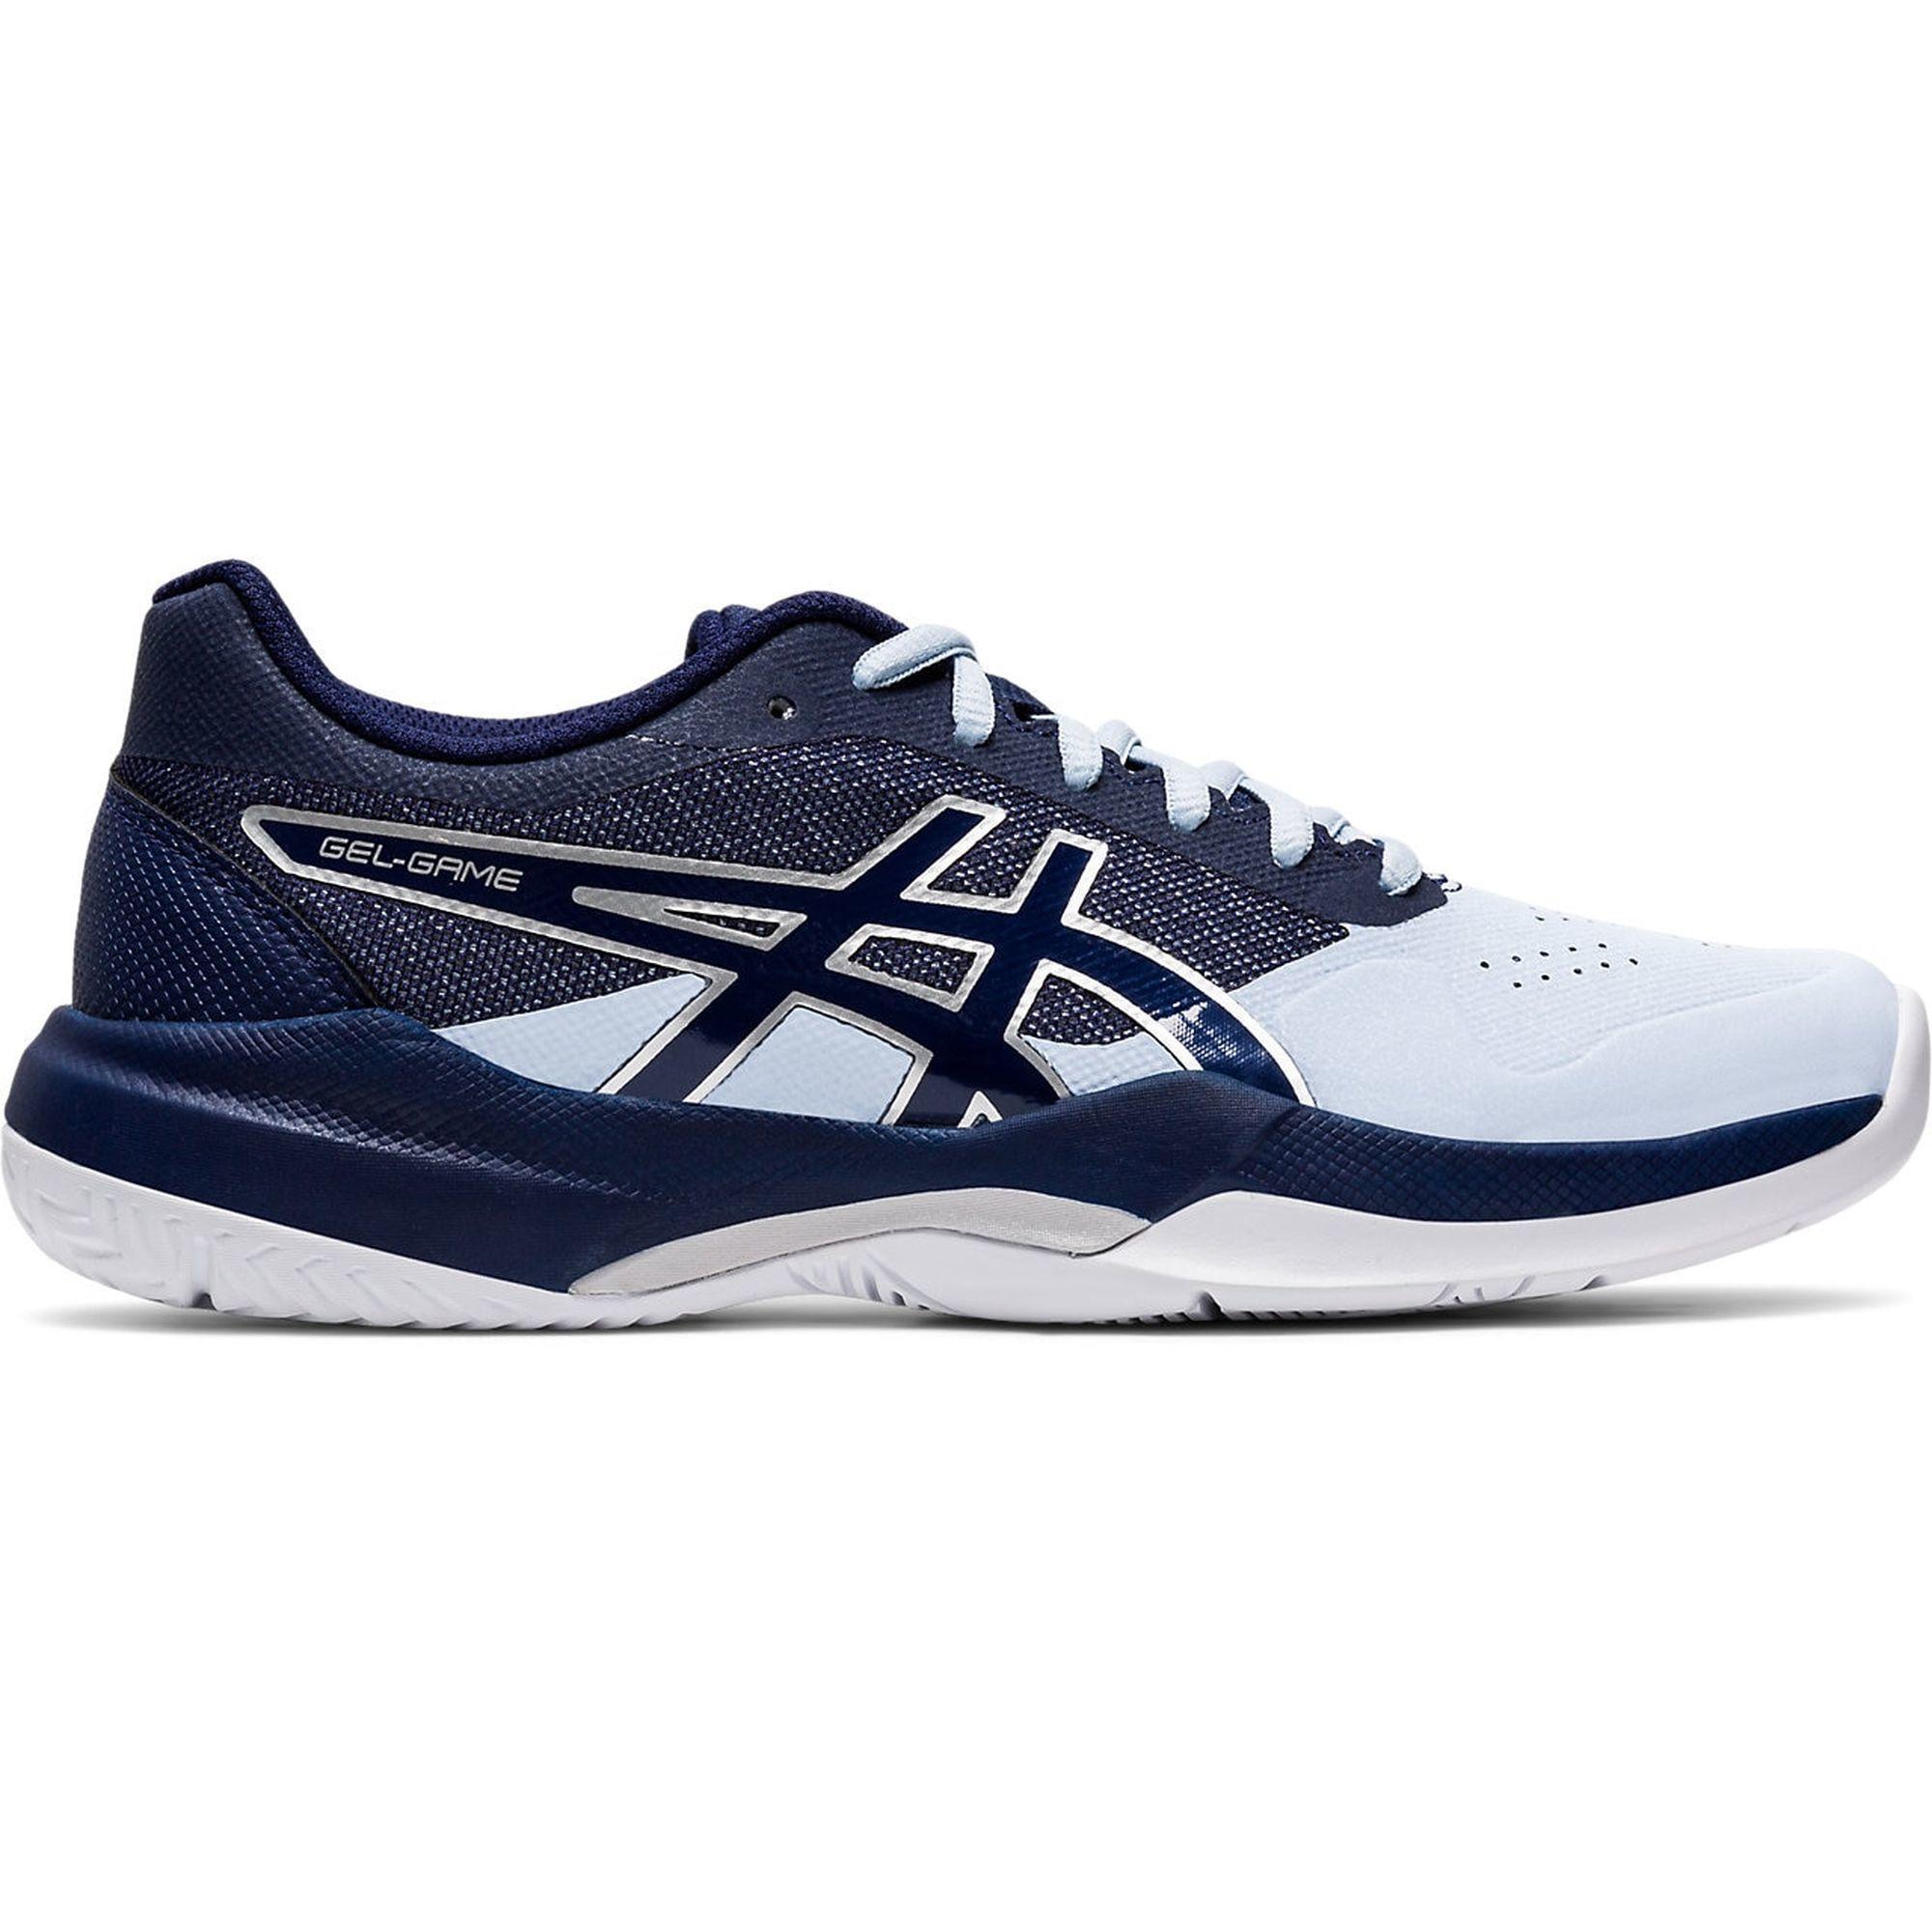 Tennis Shoes Gel-Game 7 - Blue ASICS